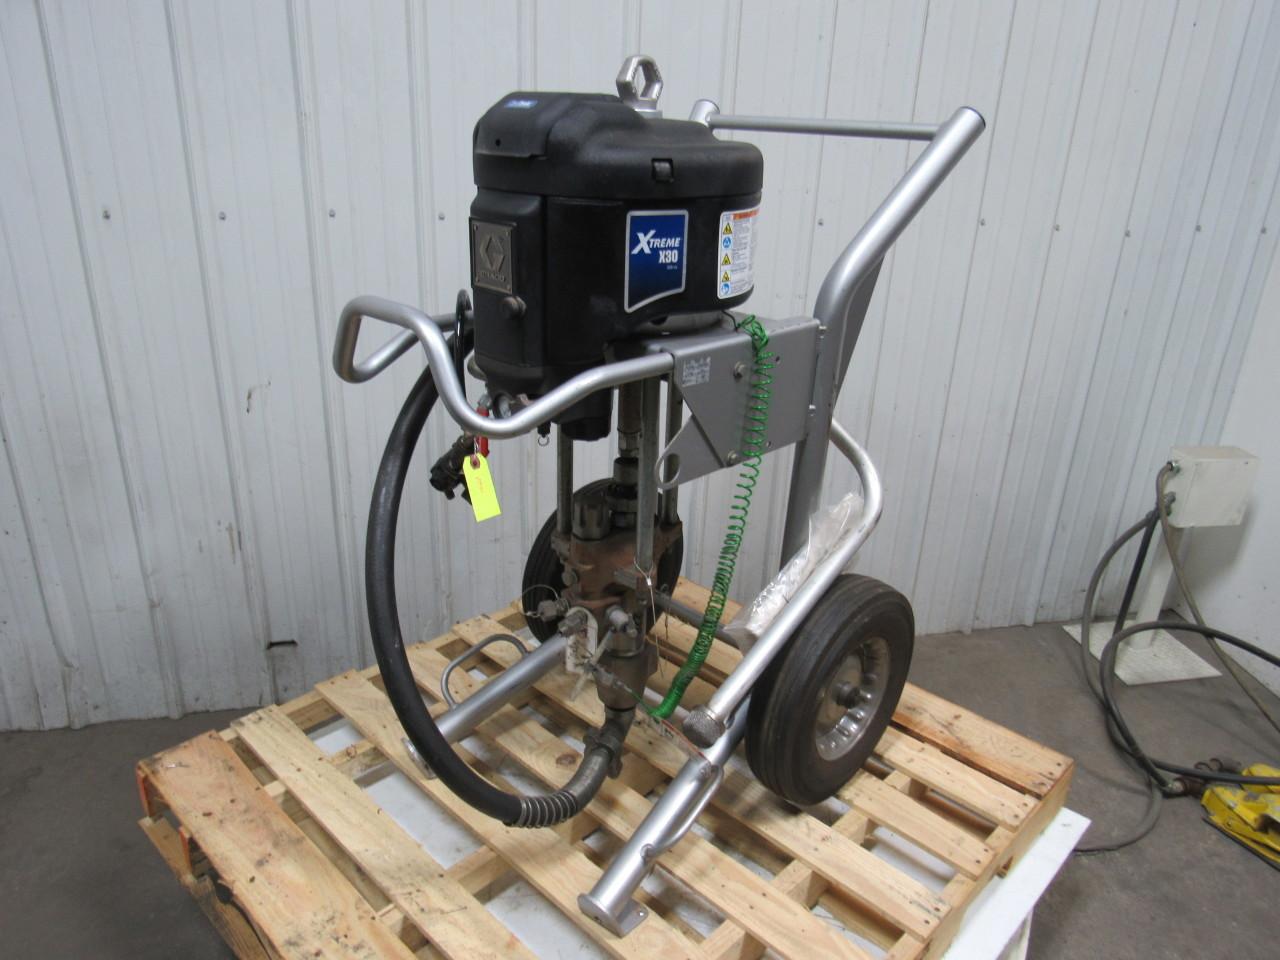 Airless Spraygun Manufacturers Mail: GRACO X30DH1 Xtreme Airless Sprayer W/ Data Trak & HD Cart